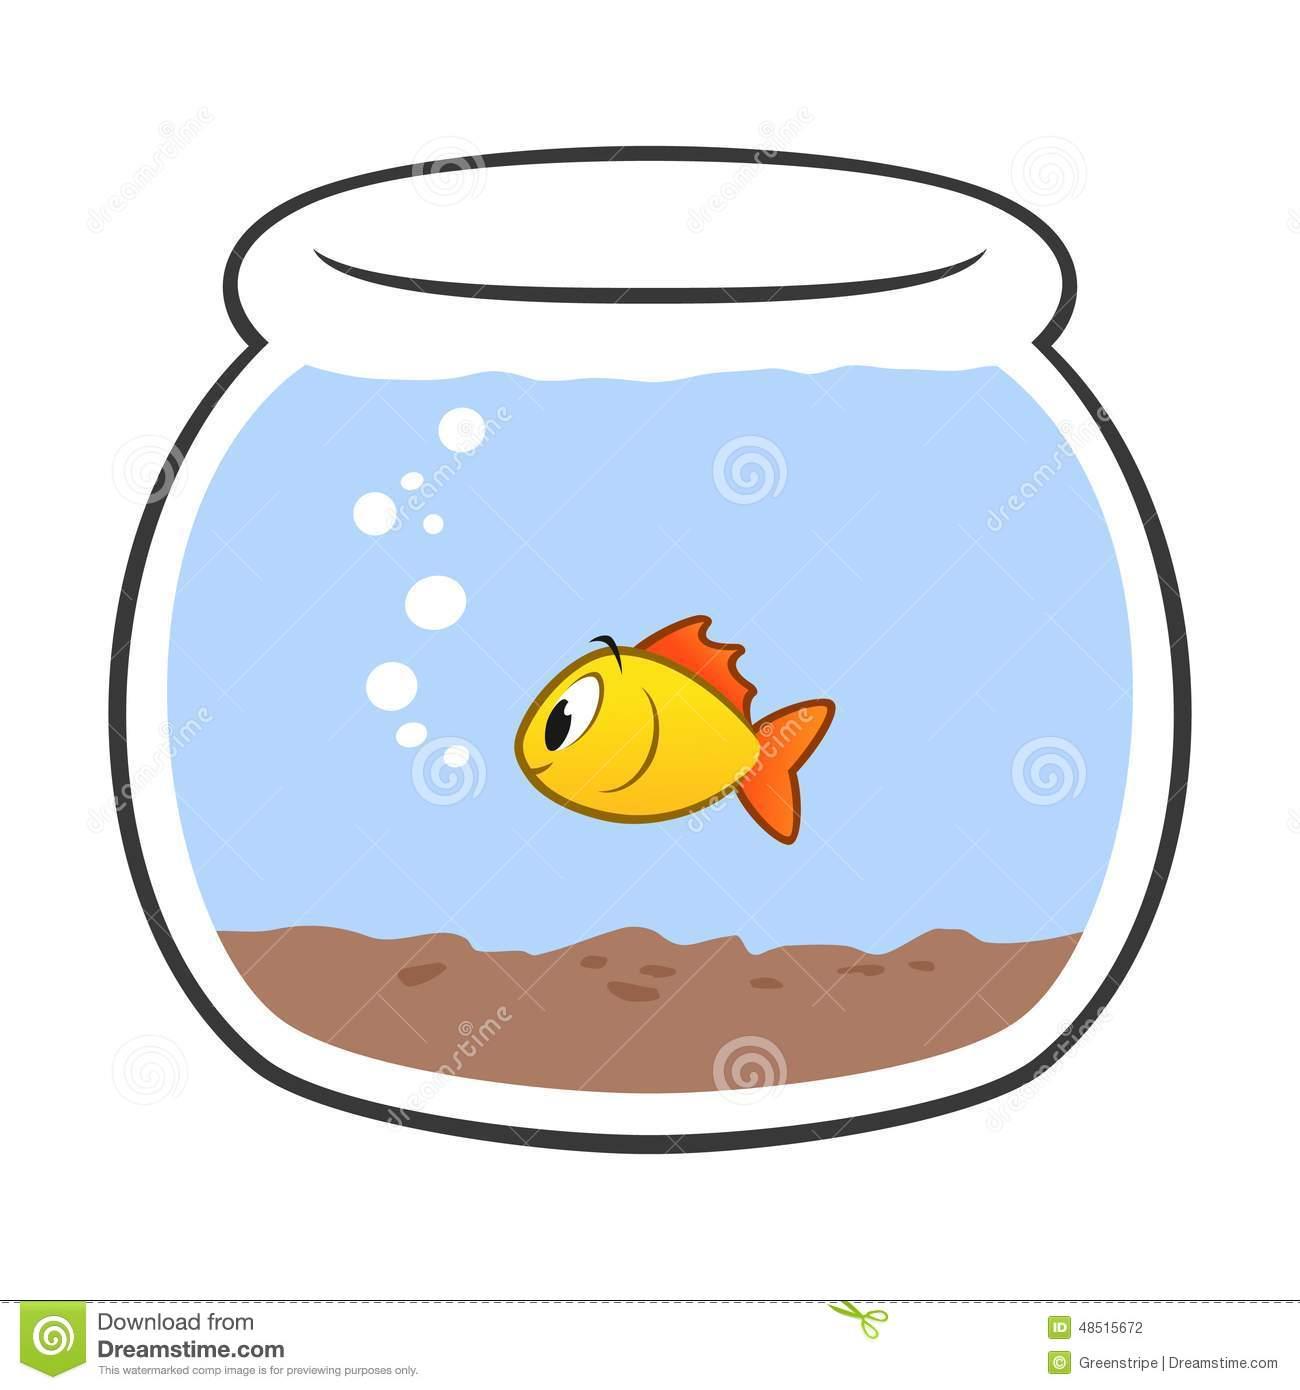 Fish Bowl clipart #12, Download drawings